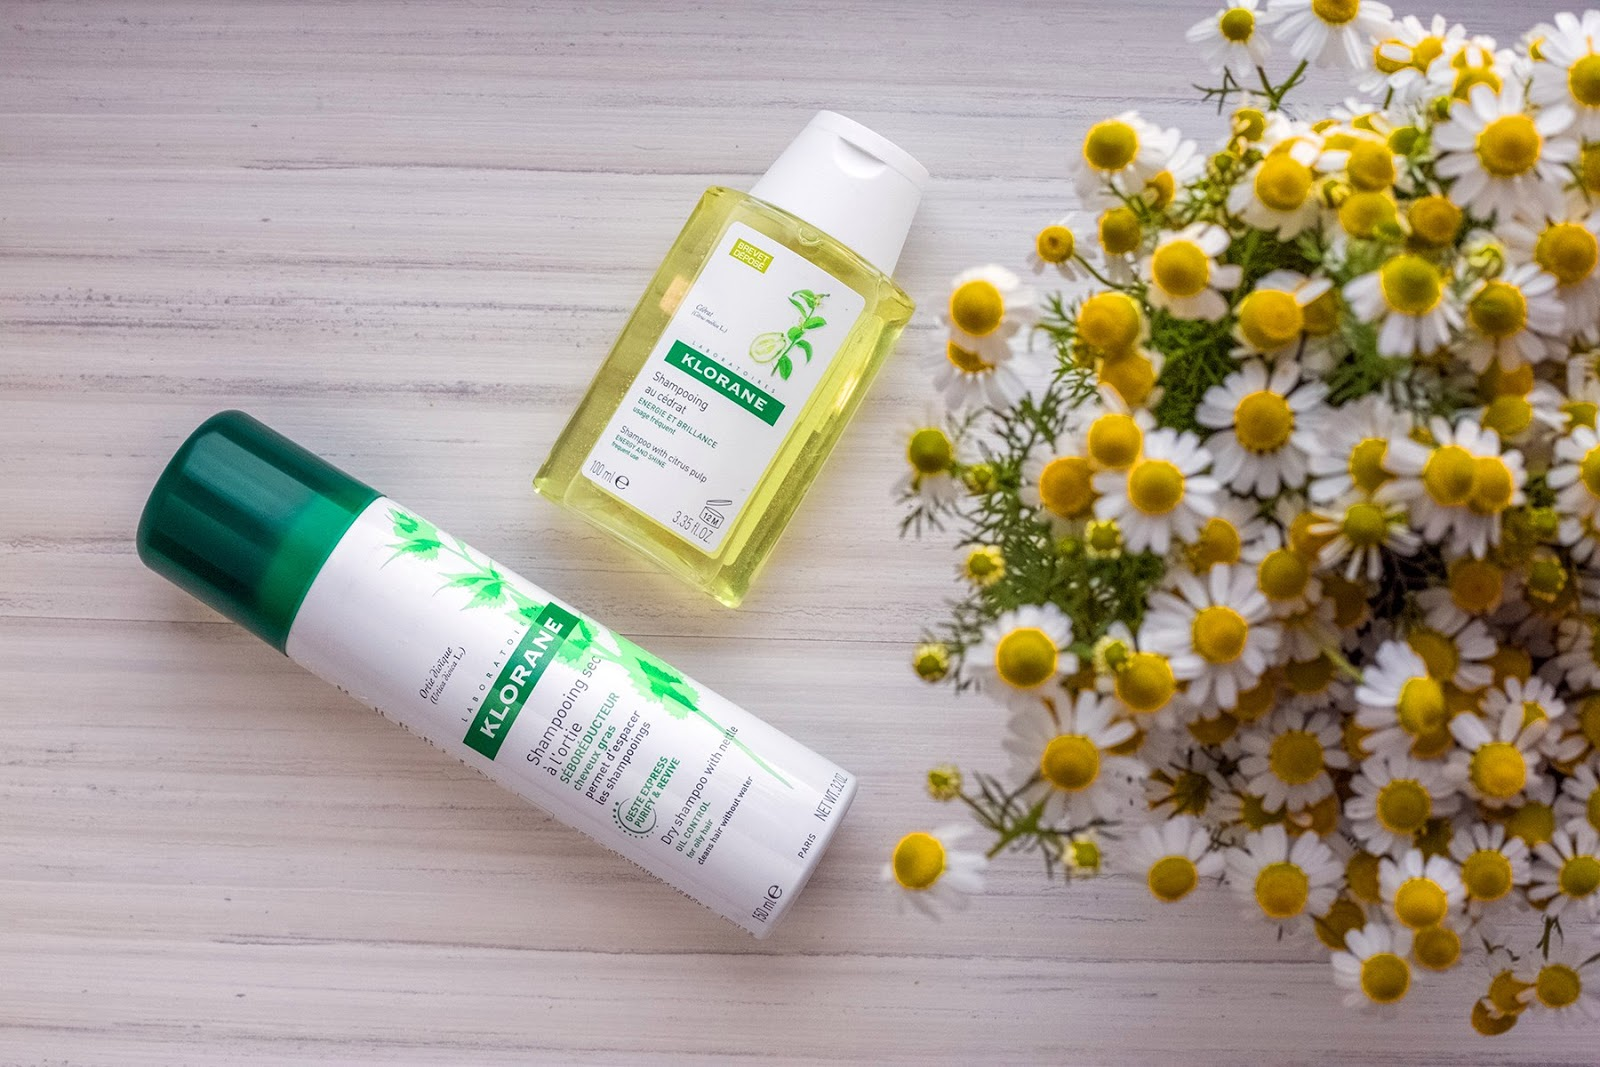 klorane shampoo buy